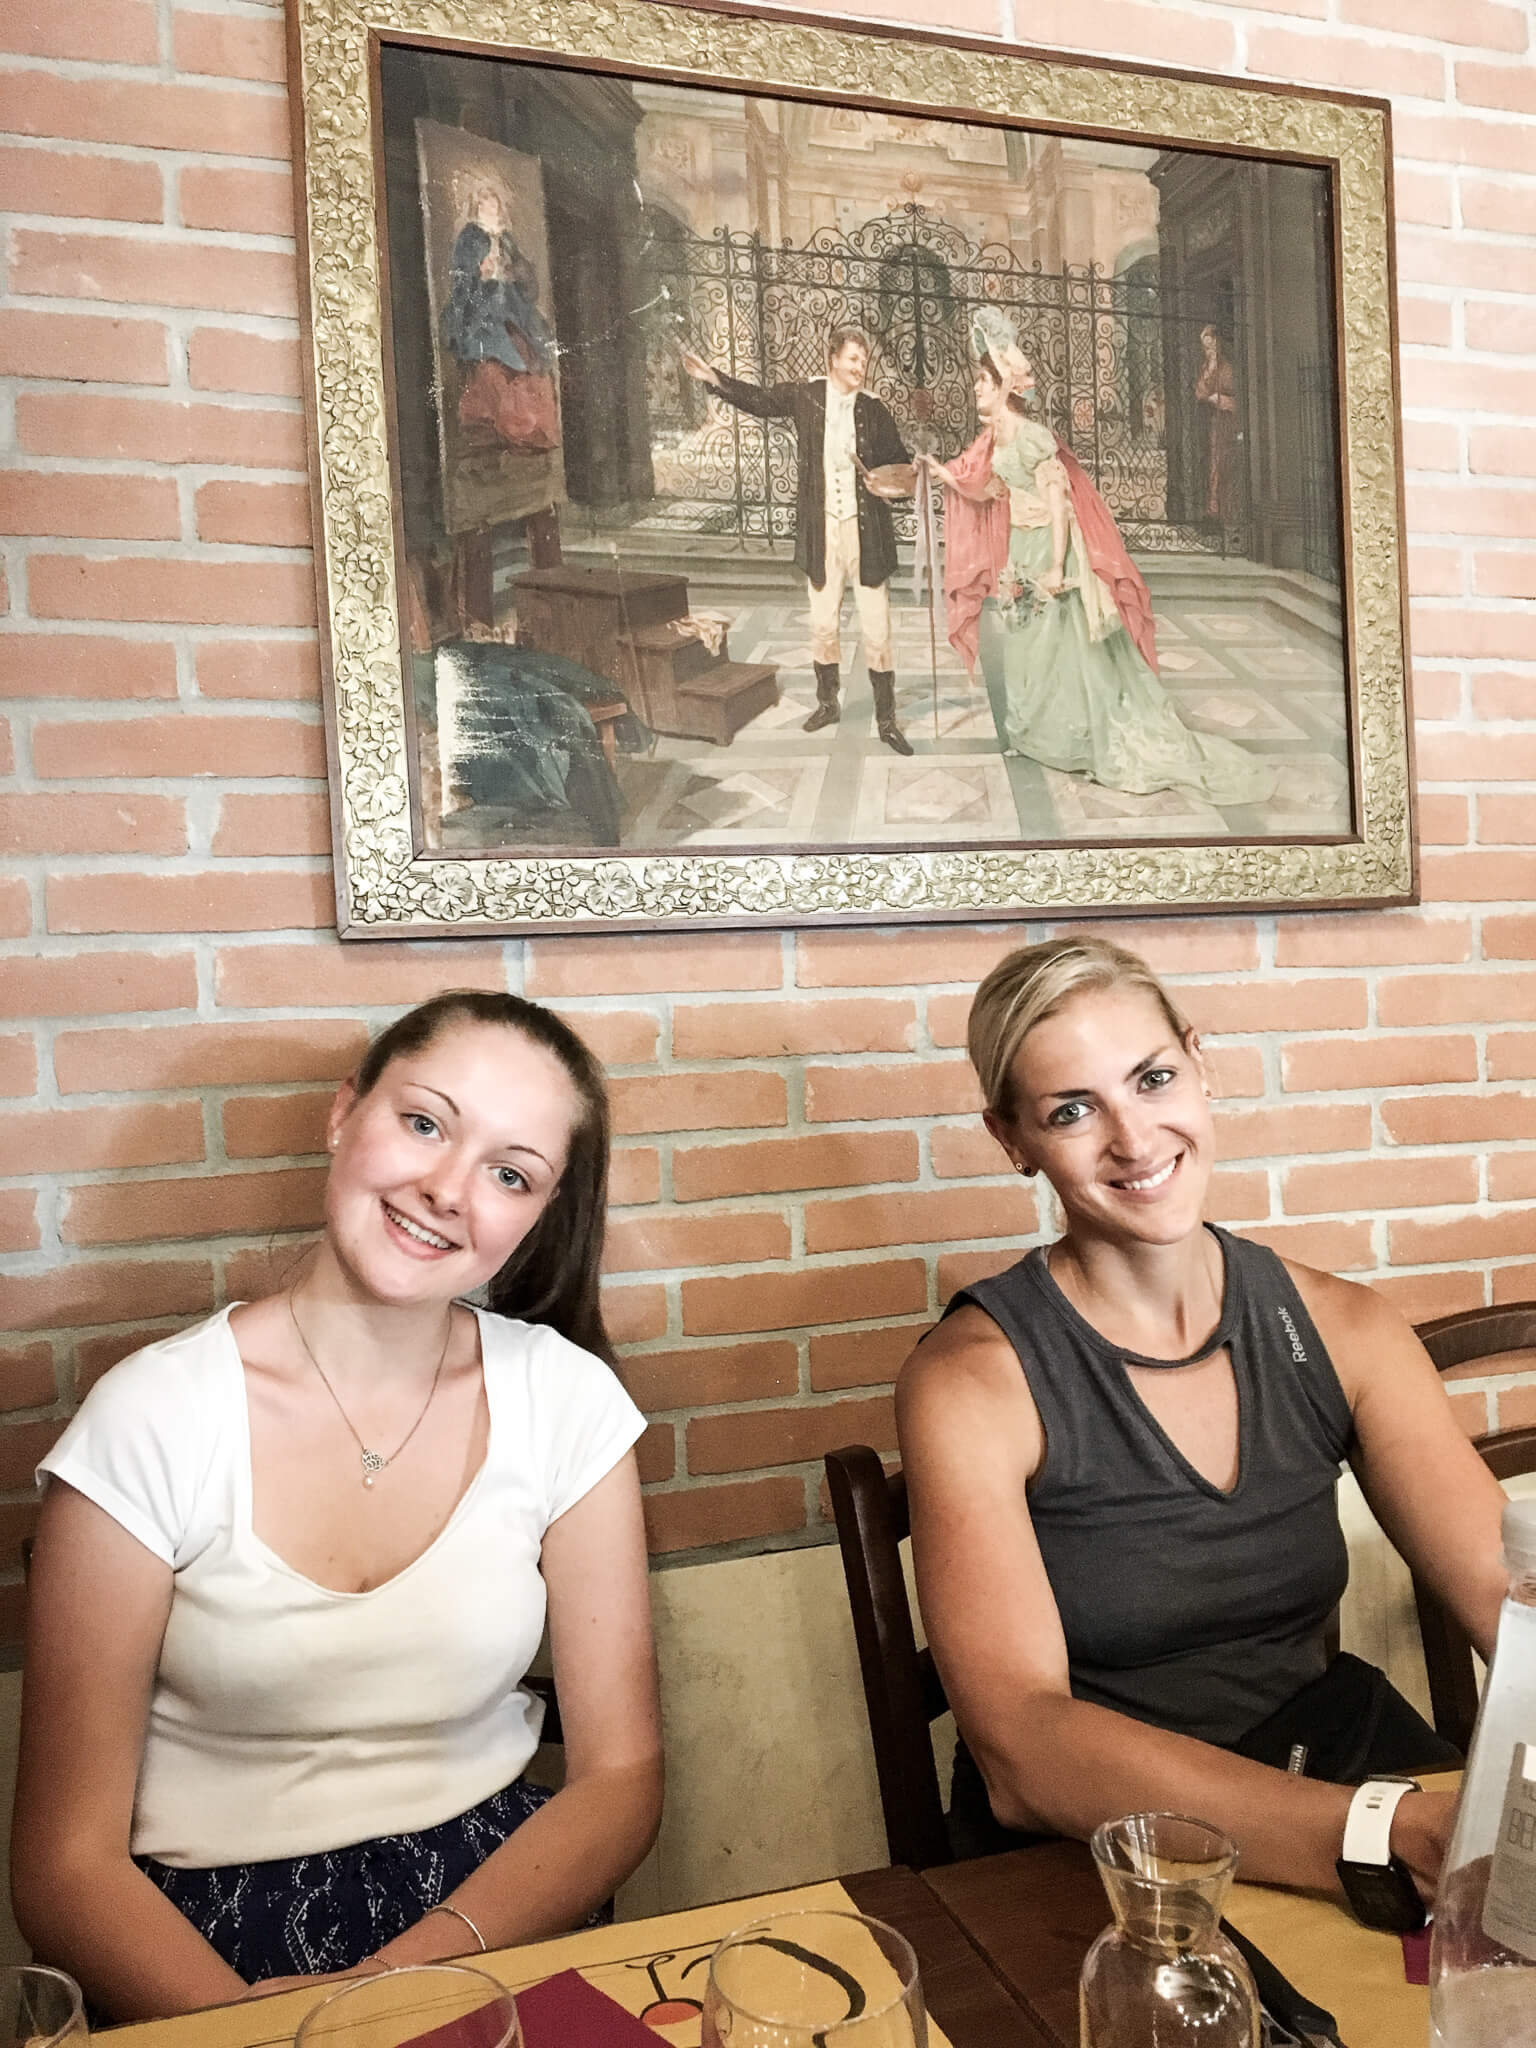 Tiramisu www.sarahkayhoffman.com #tiramisu #dessert #italy SKH and Ceci Venice